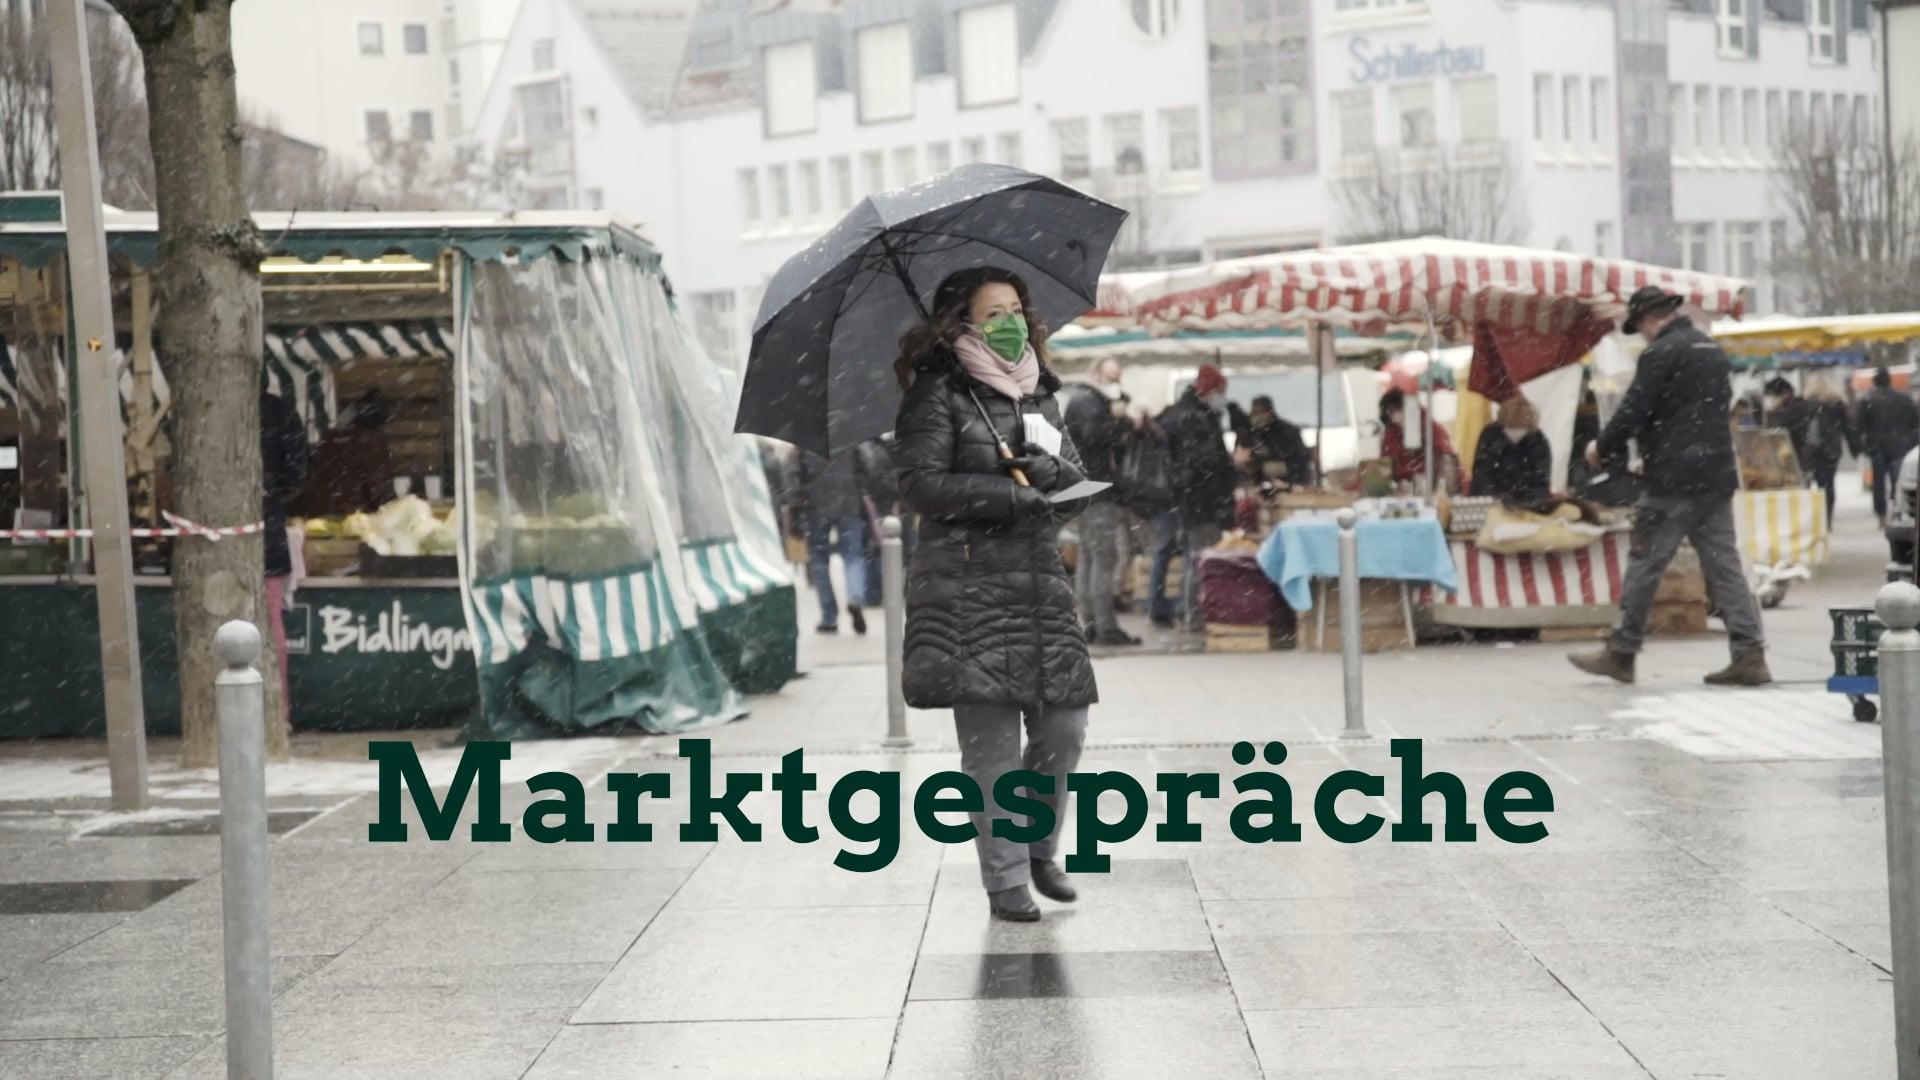 marktgespräche mit ayla cataltepe - teaser